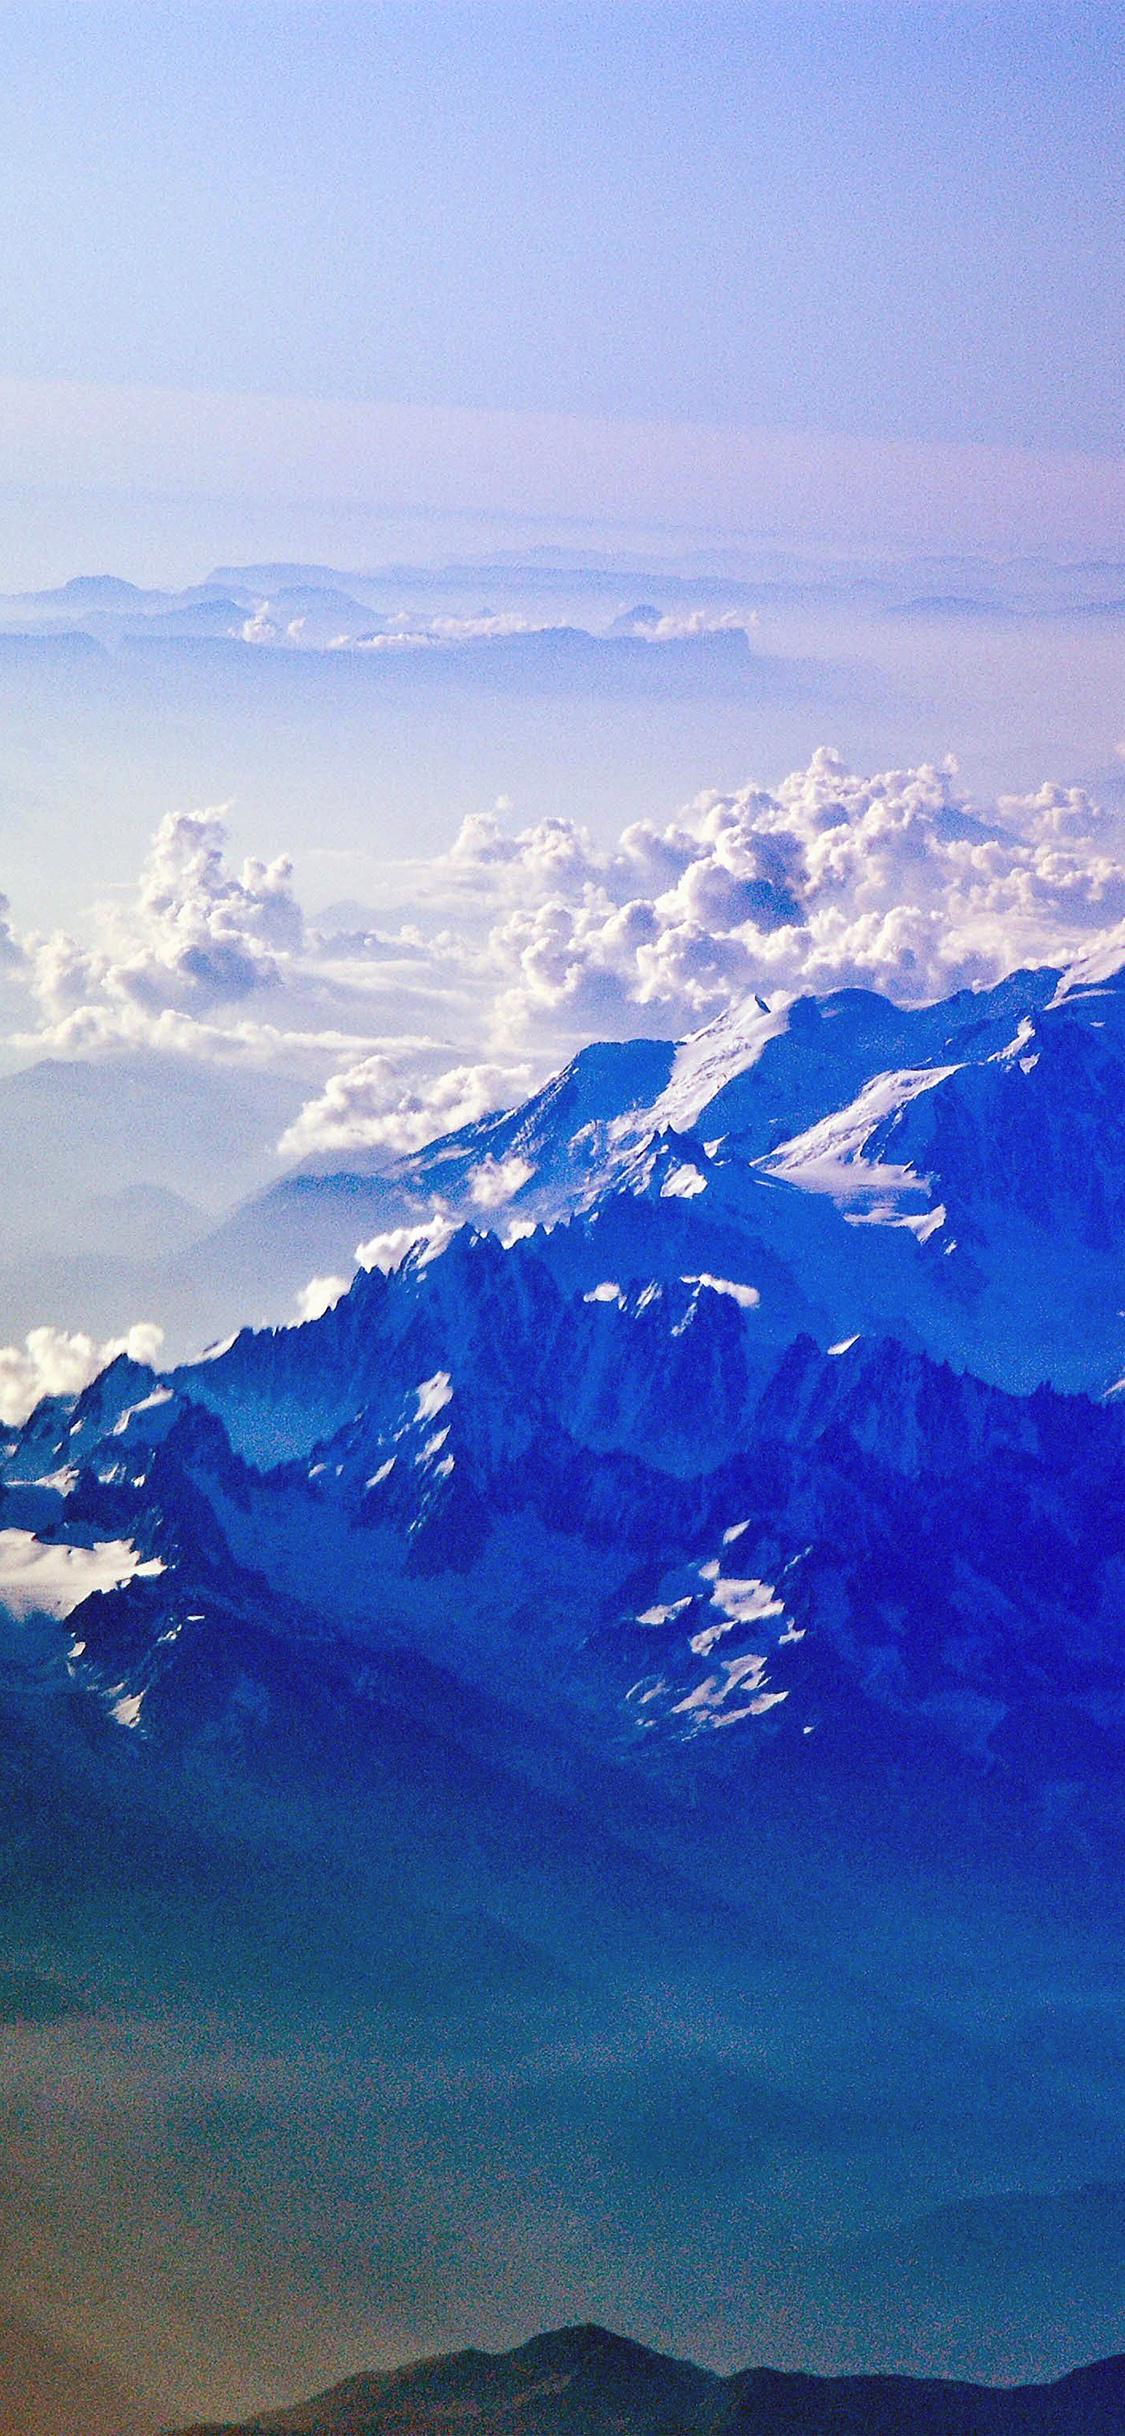 iPhonexpapers.com-Apple-iPhone-wallpaper-nn33-mountain-snow-winter-blue-nature-cloud